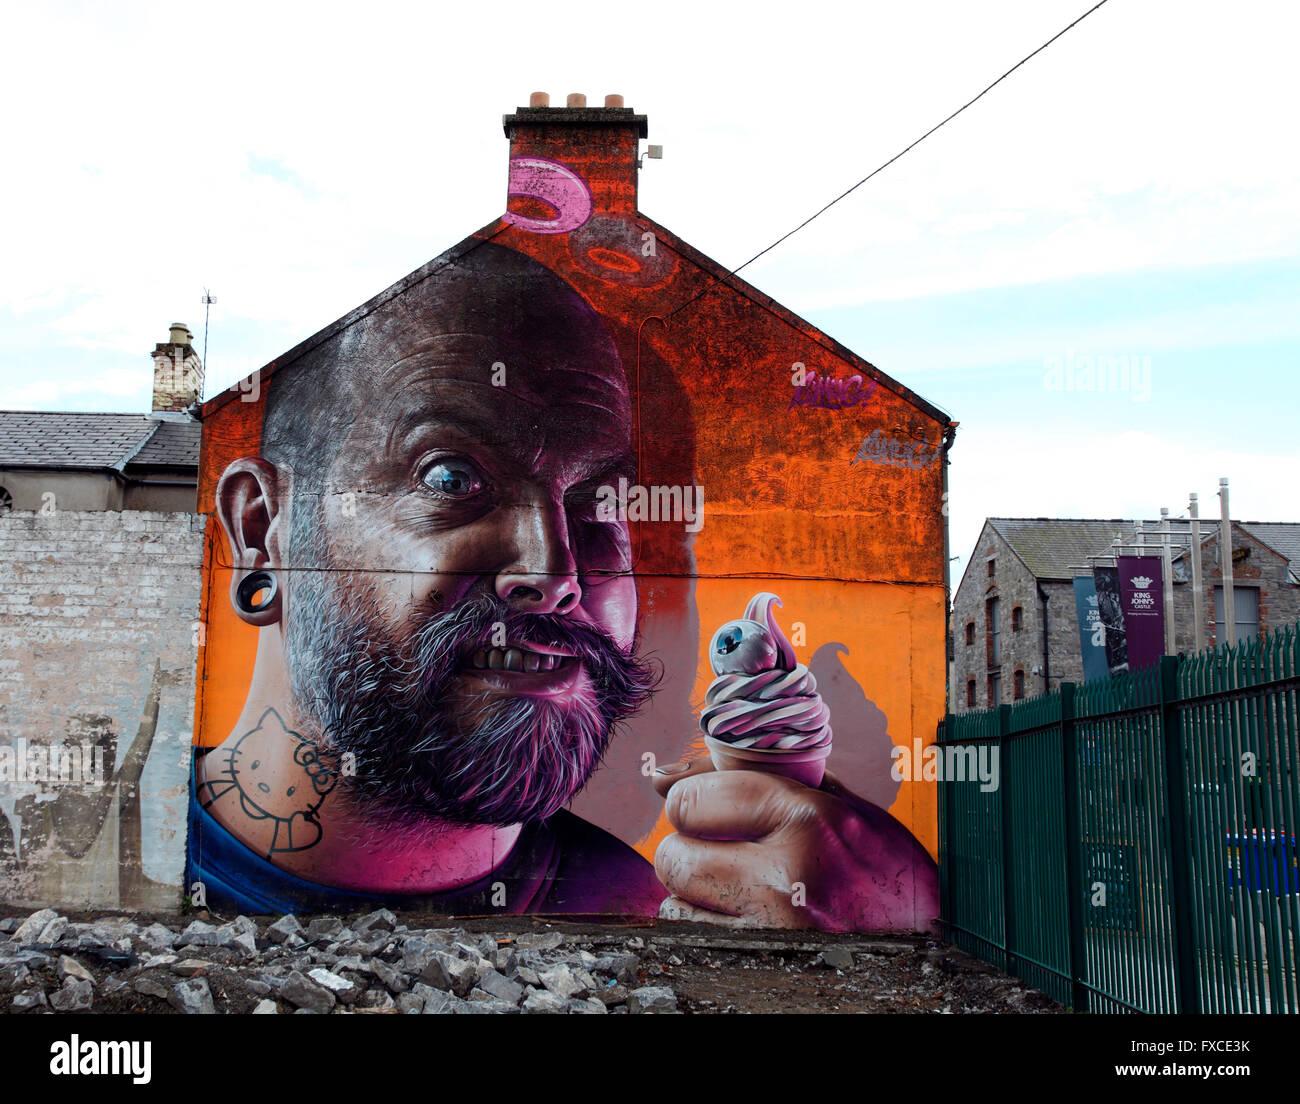 surreal graffiti by Smug - Stock Image